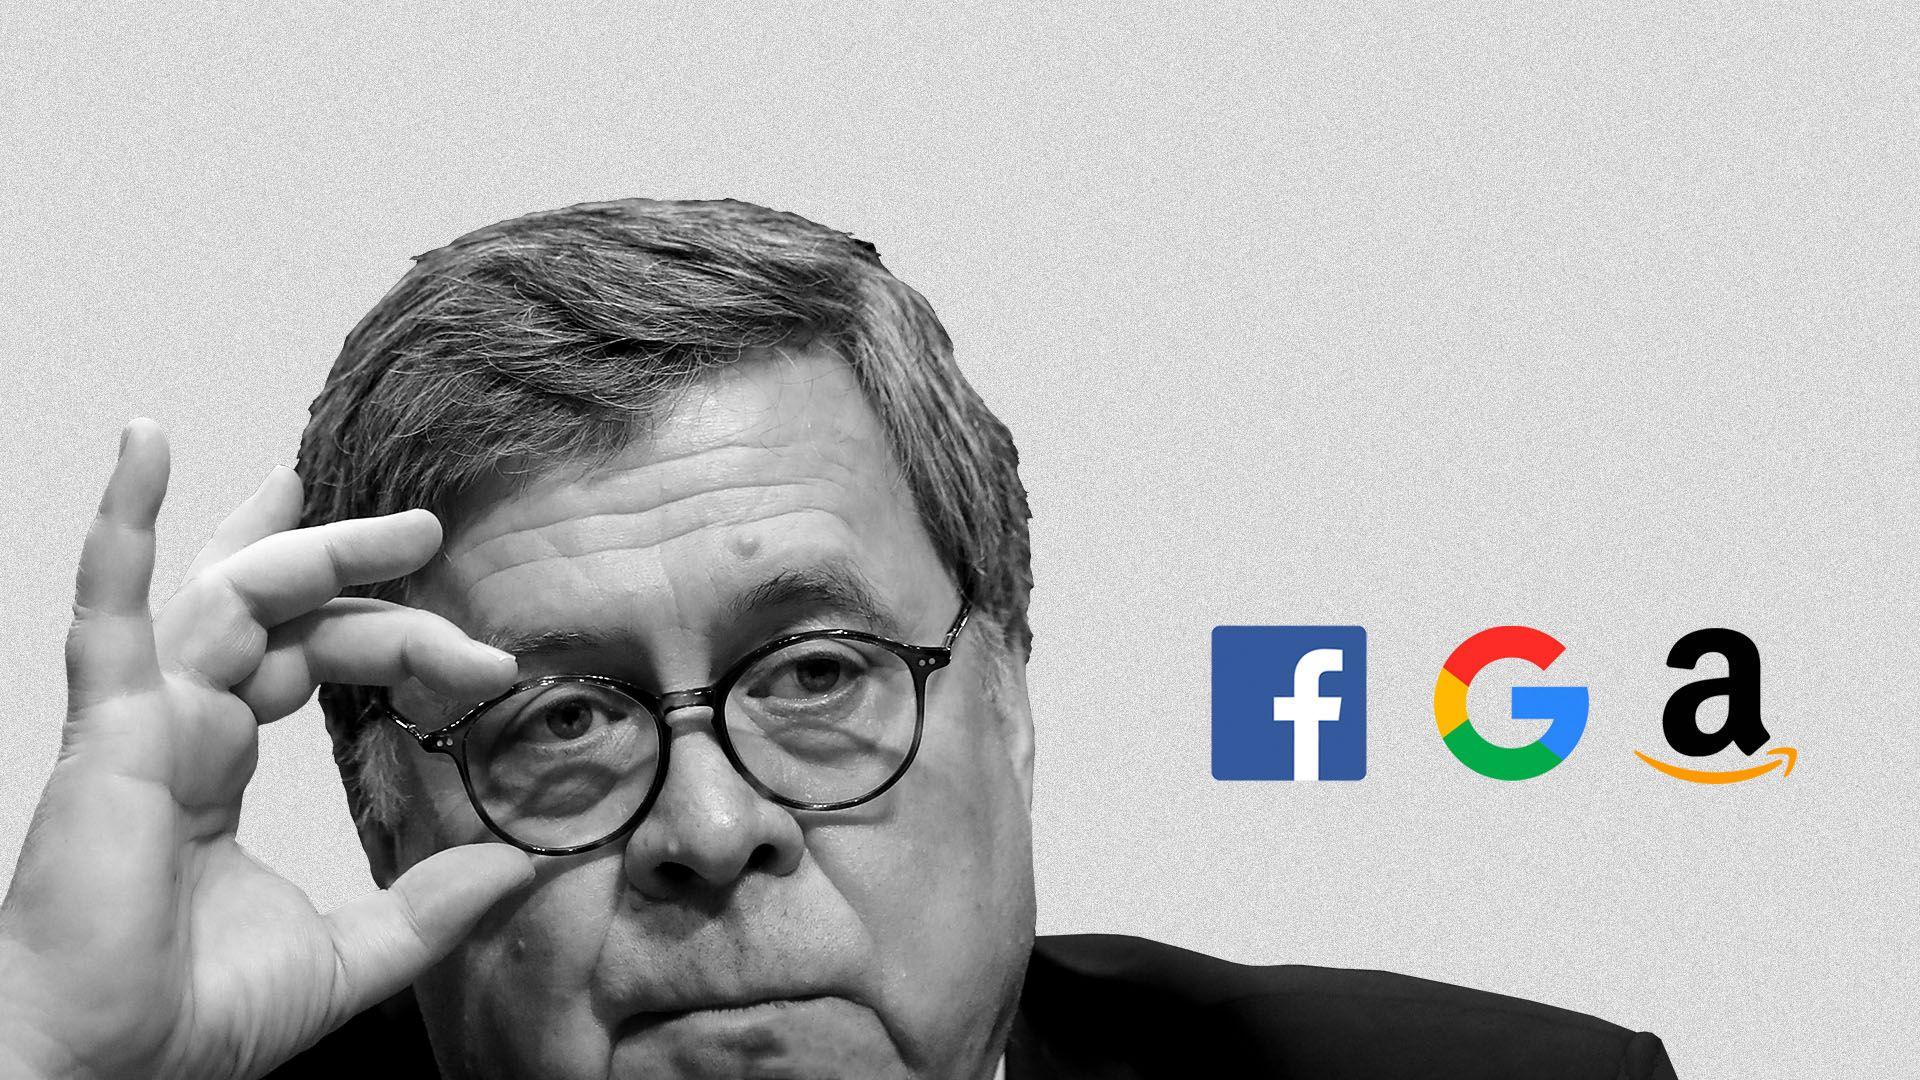 Illustration of Bill Barr scrutinizing logos of Facebook, Google, and Amazon